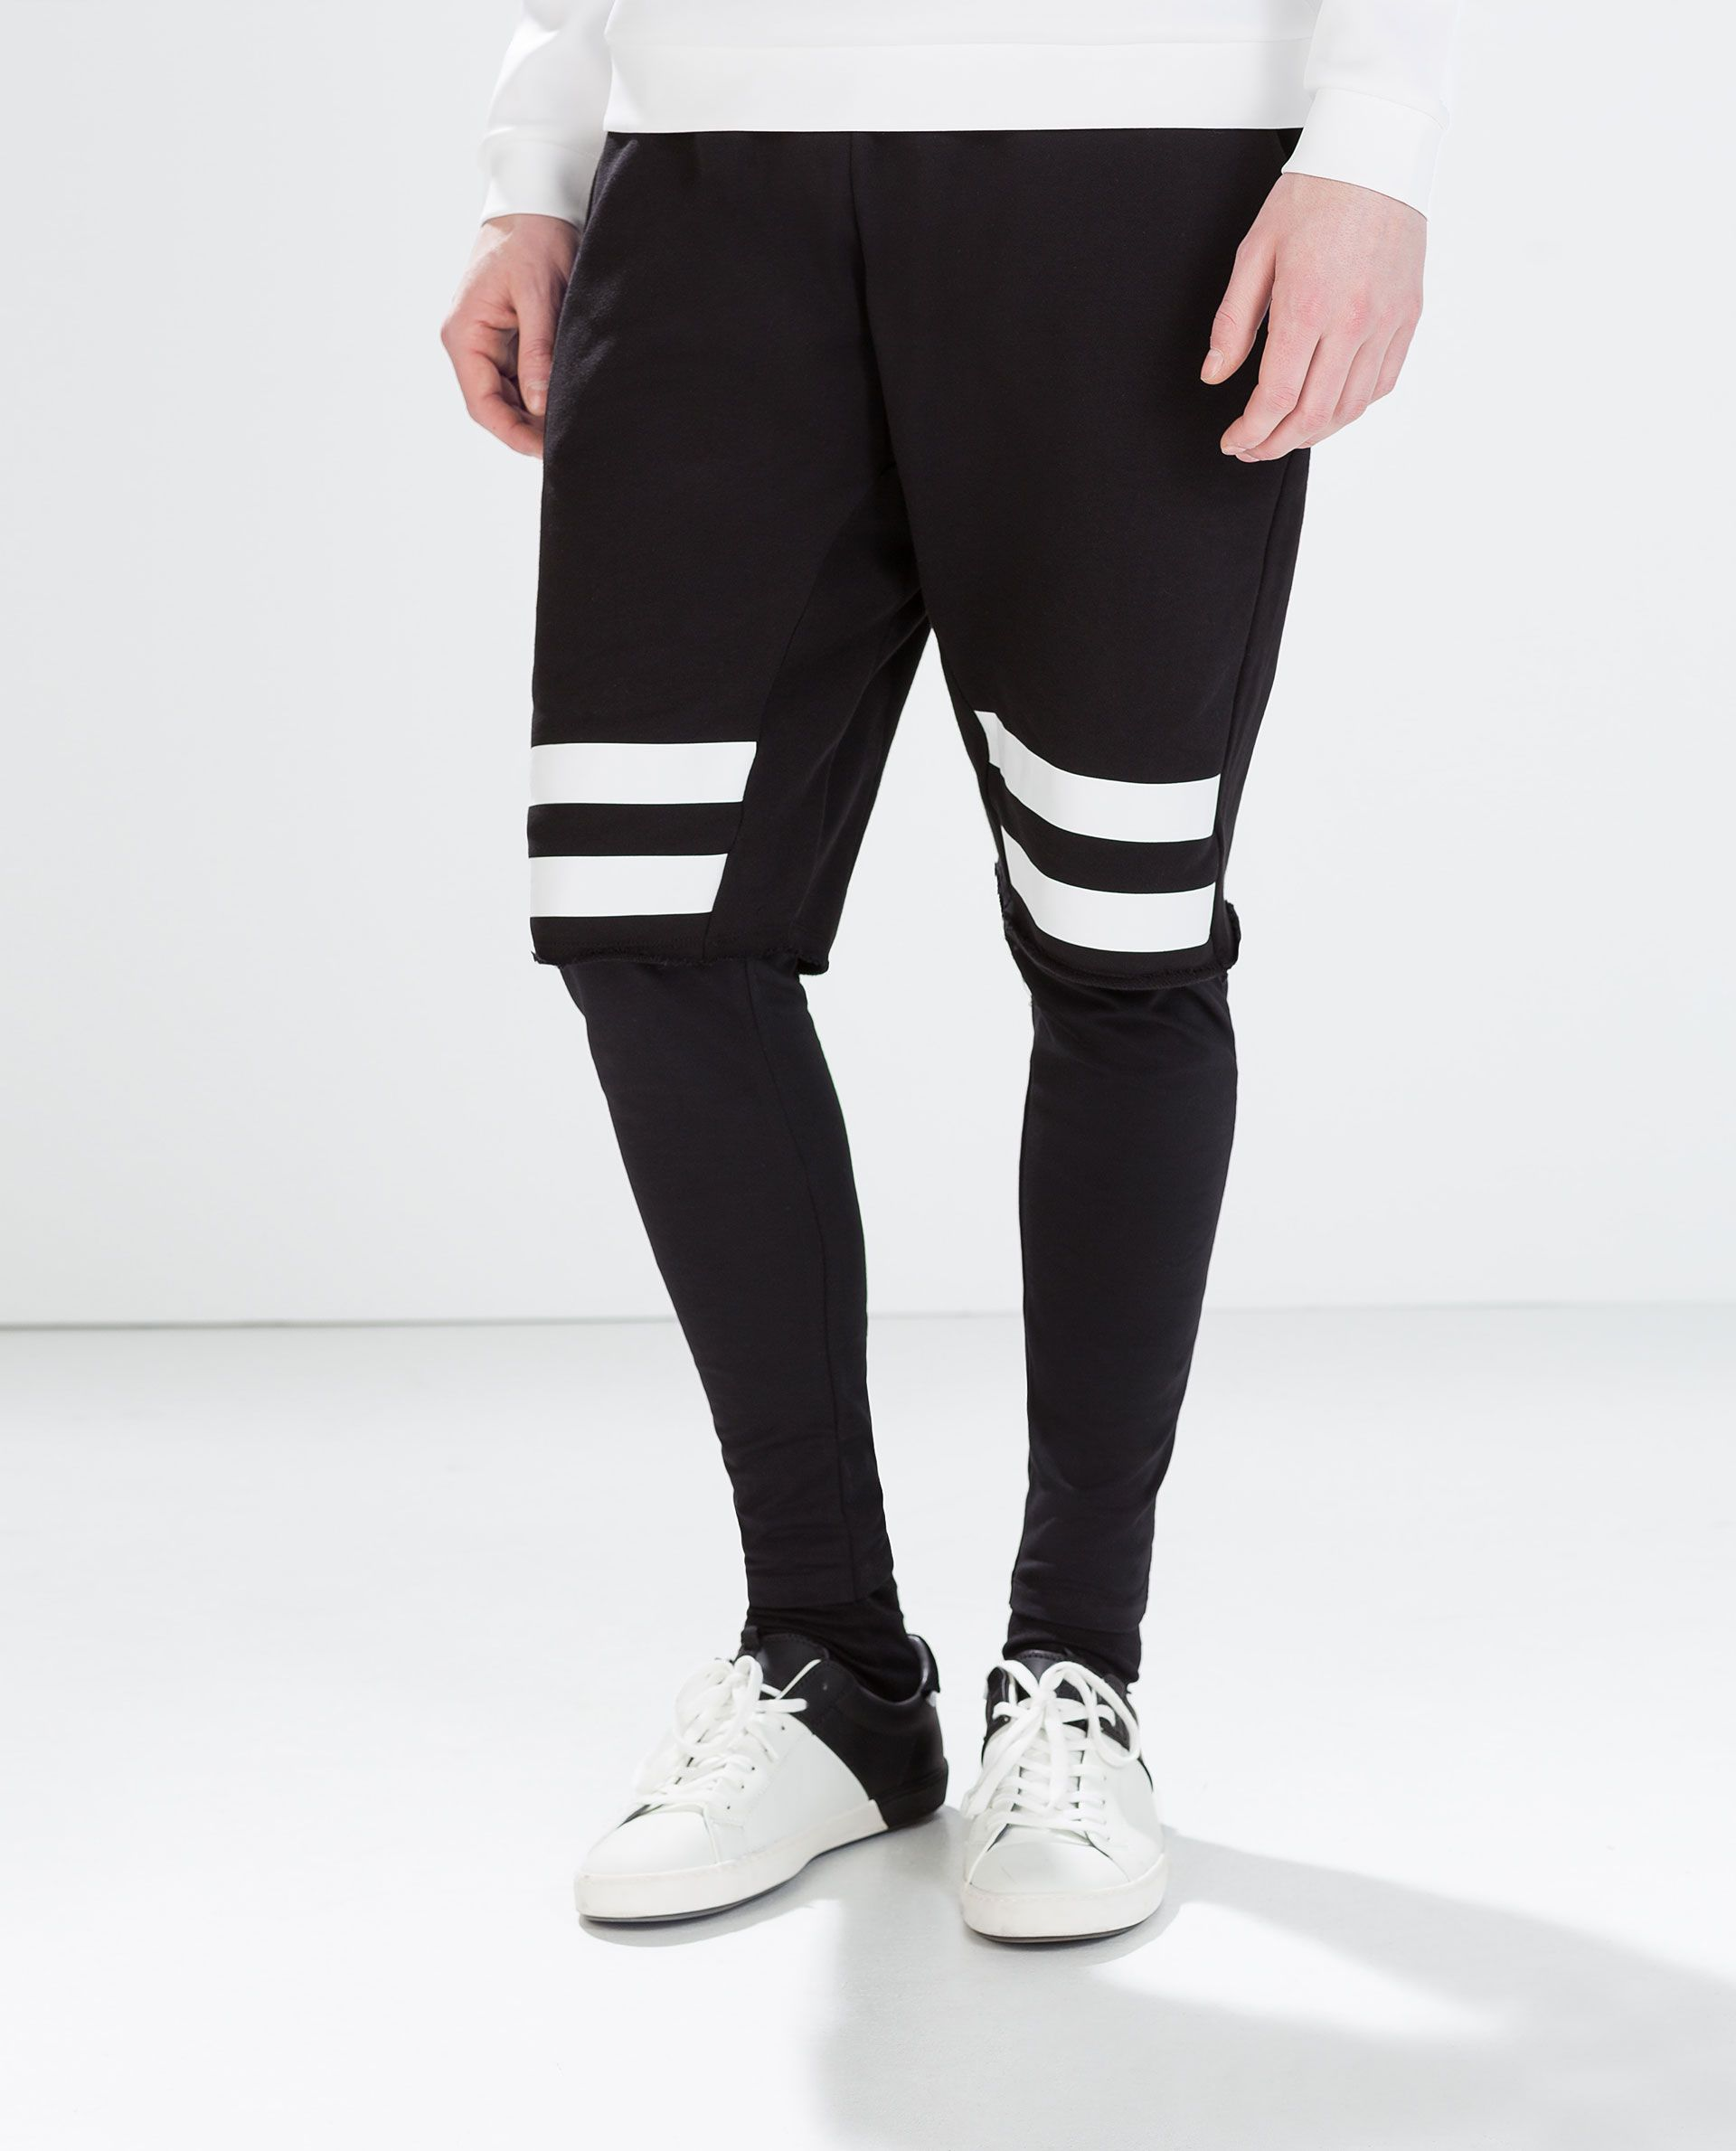 ZARA - MAN - STRIPED SHORTS WITH LEGGINGS | Striped shorts ... - photo#23